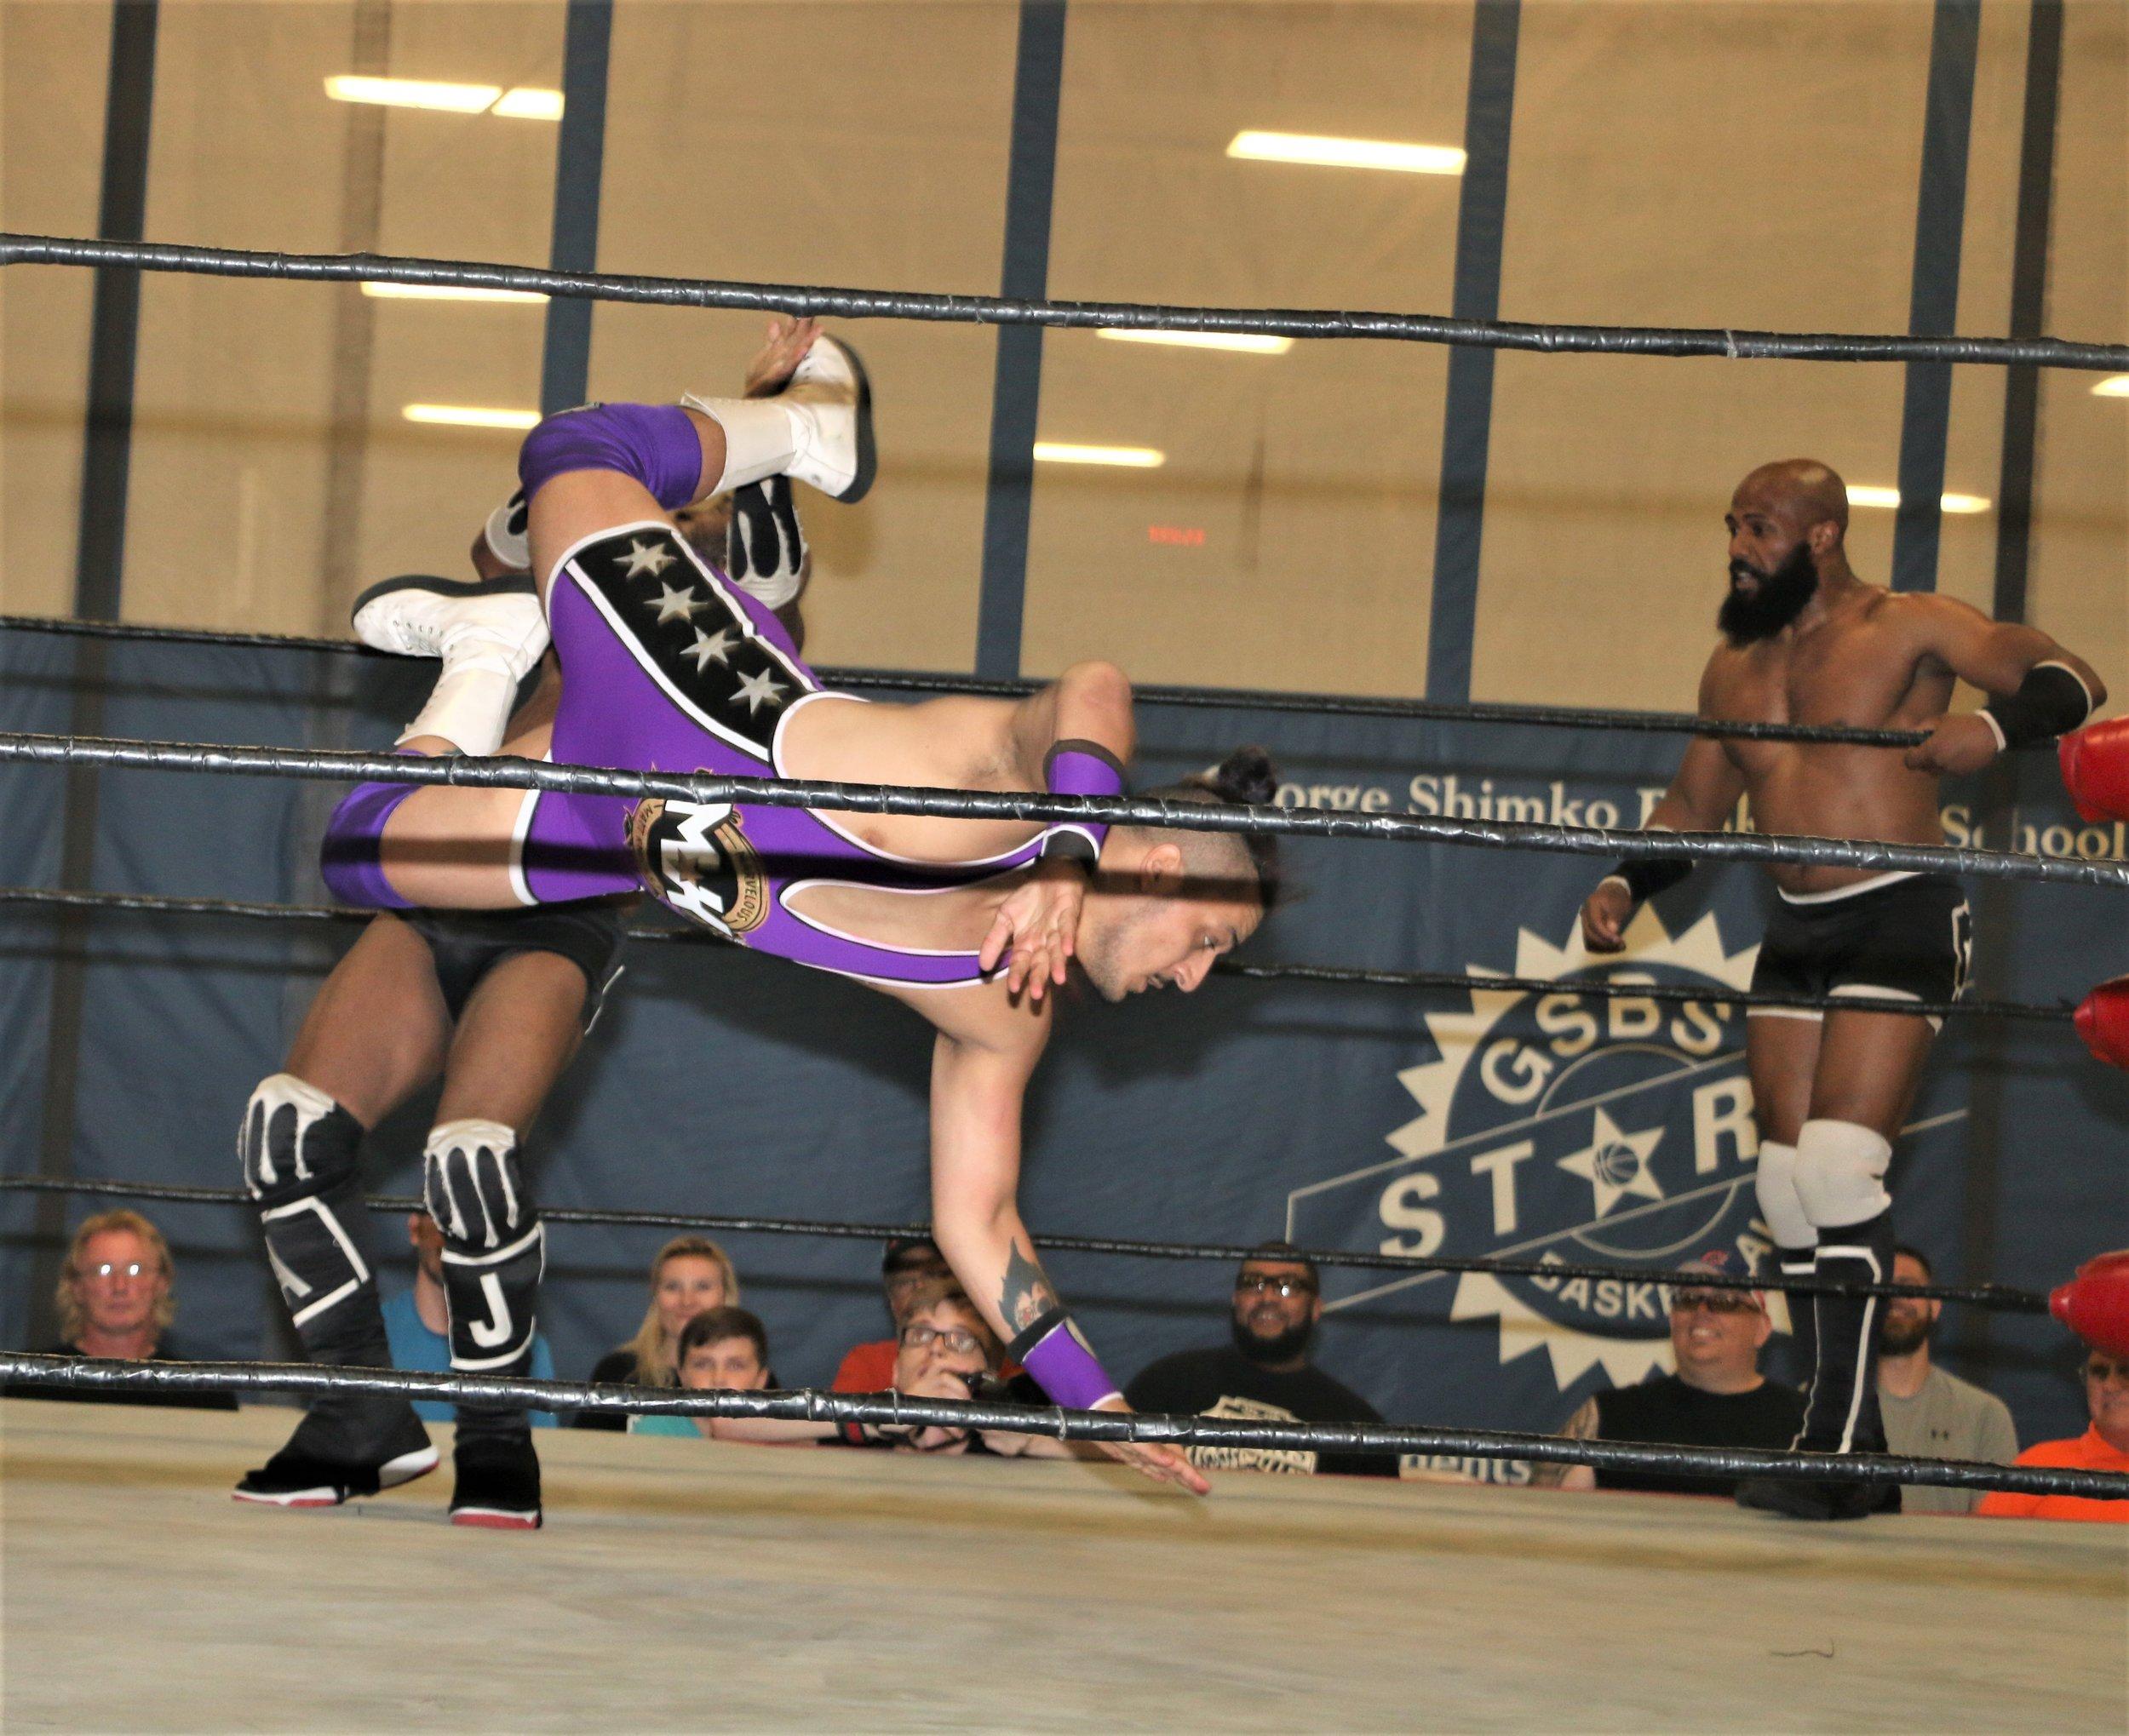 Matt Knicks dropkicks Acid Jaz during their tag-team match.